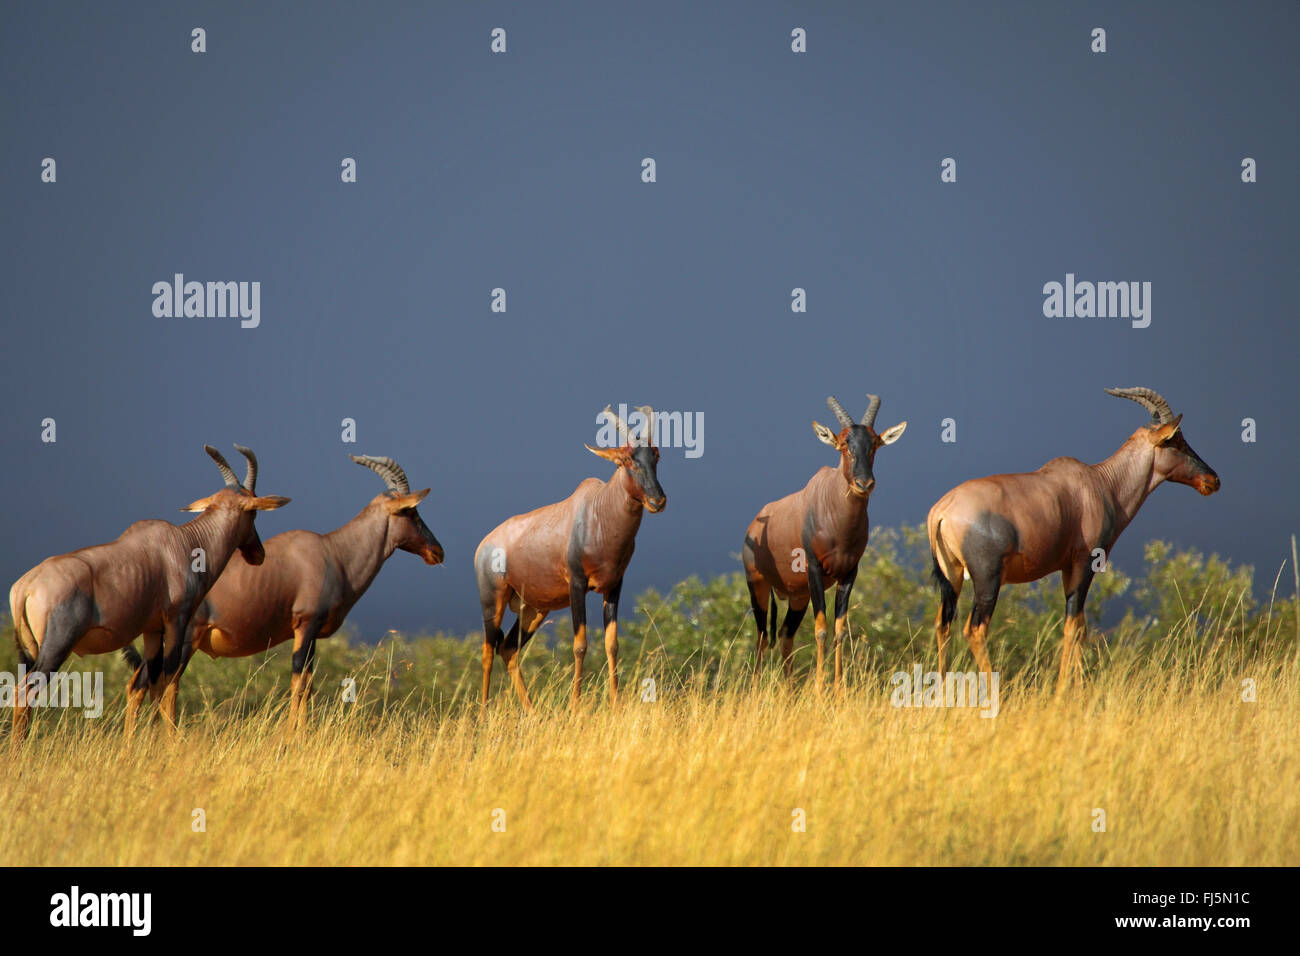 topi, tsessebi, korrigum, tsessebe (Damaliscus lunatus jimela), five topis standing together on high grass, Kenya, - Stock Image